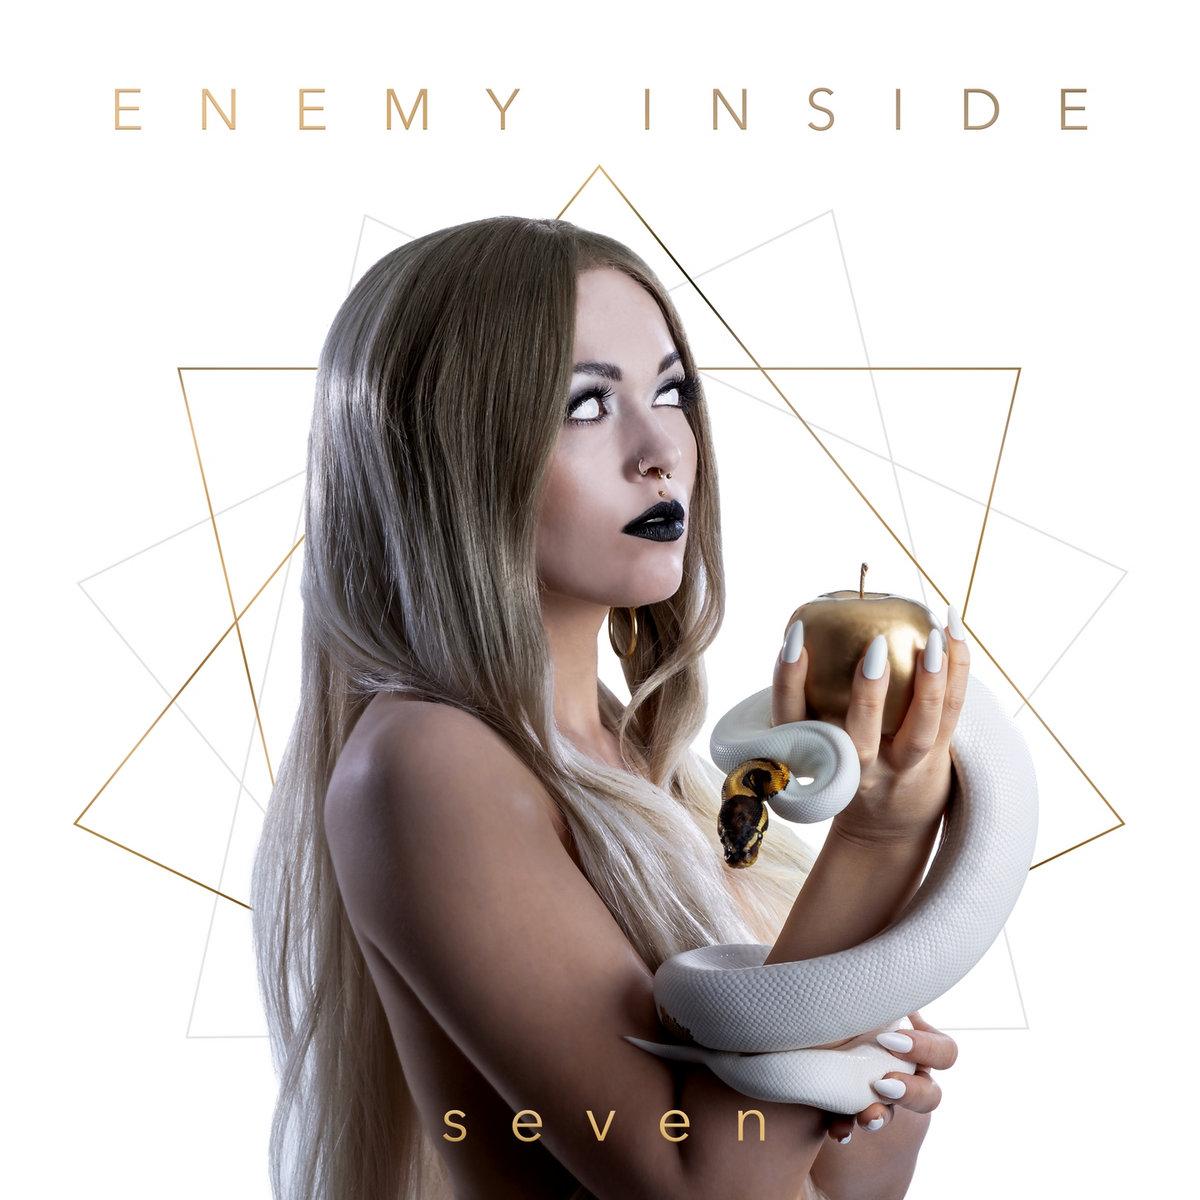 ENEMY INSIDE - album